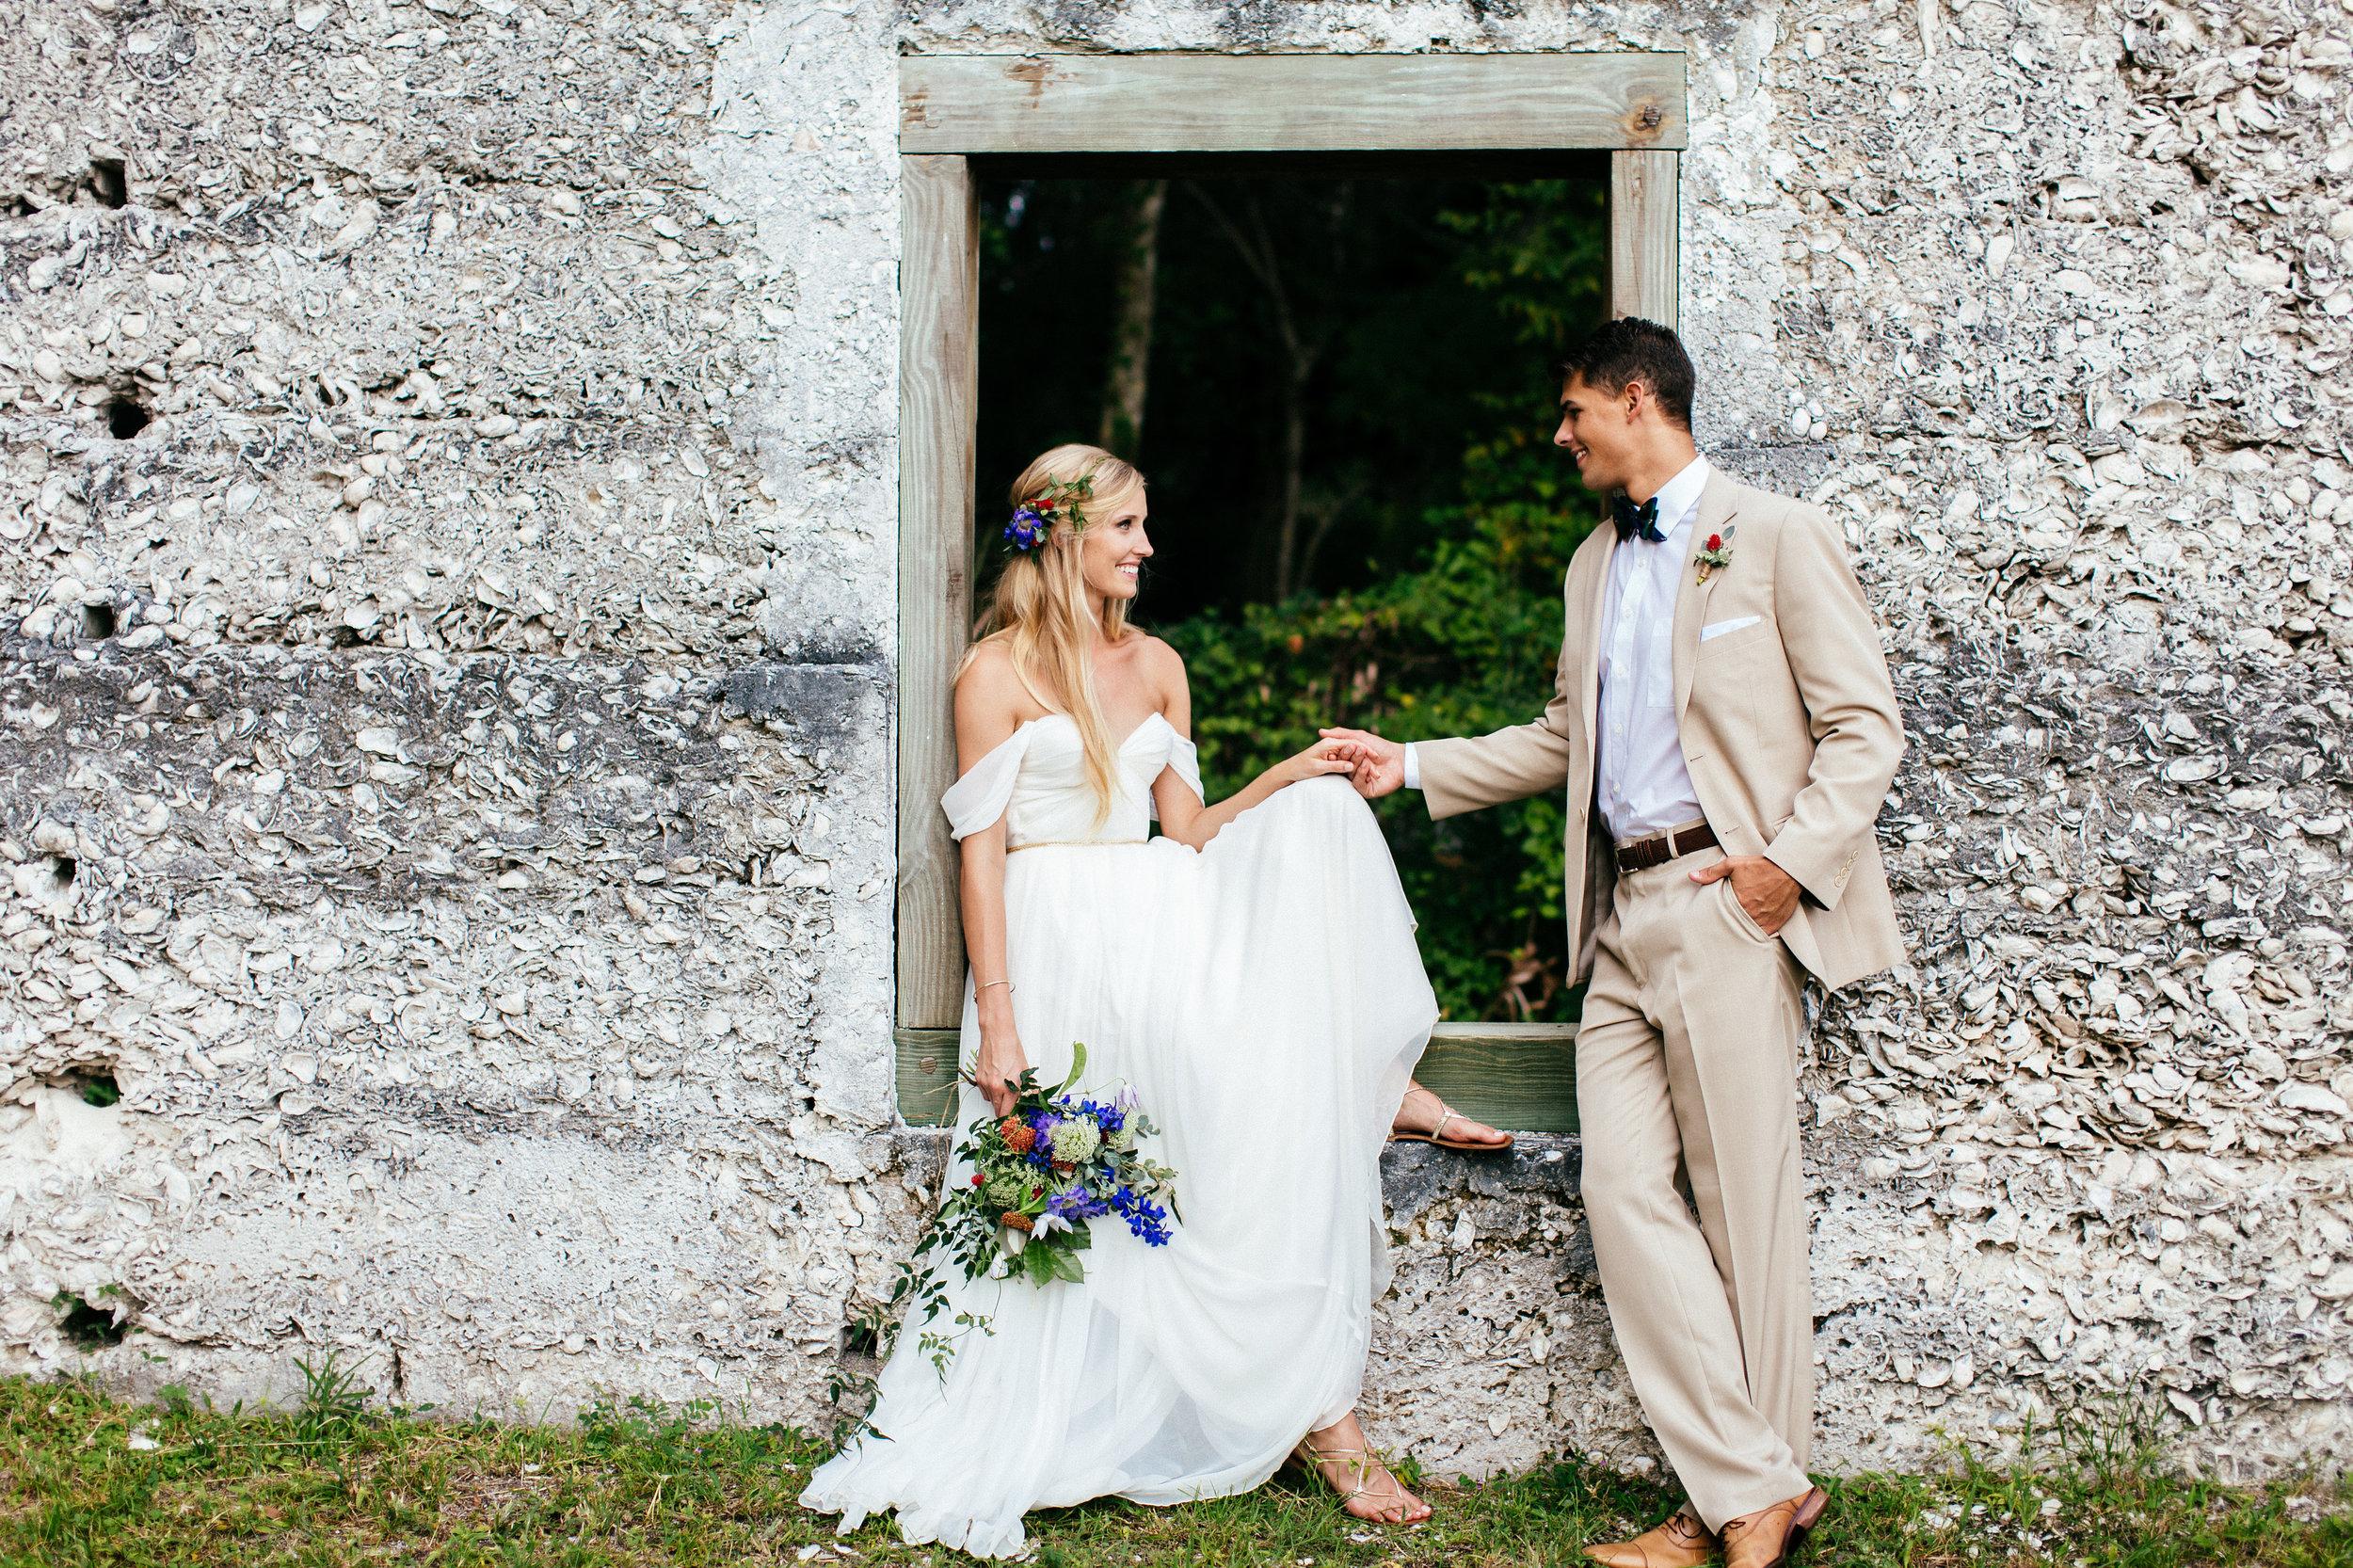 christina-karst-photography-ivory-and-beau-bridal-boutique-sarah-seven-lafayette-boho-bride-boho-bridal-boutique-indie-bridal-boutique-savannah-bridal-boutique-savannah-wedding-dresses-savannah-bridal-gowns-23.jpg